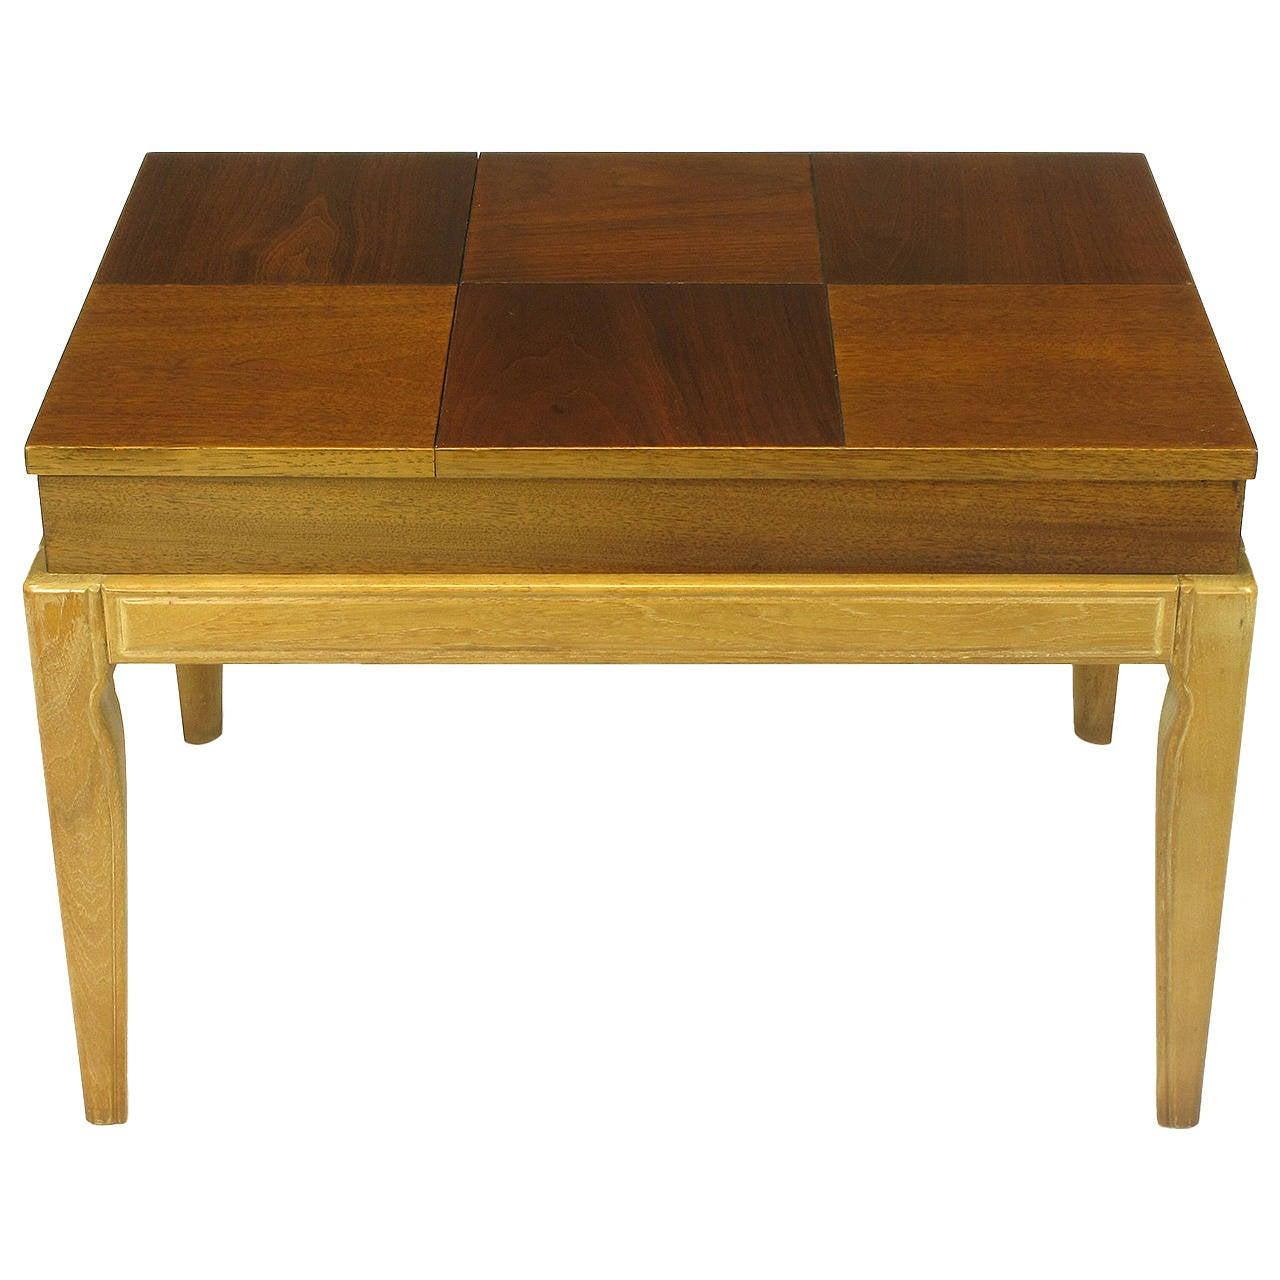 John Van Koert Casa Del Sol Parquetry Walnut End Table With Opening Top